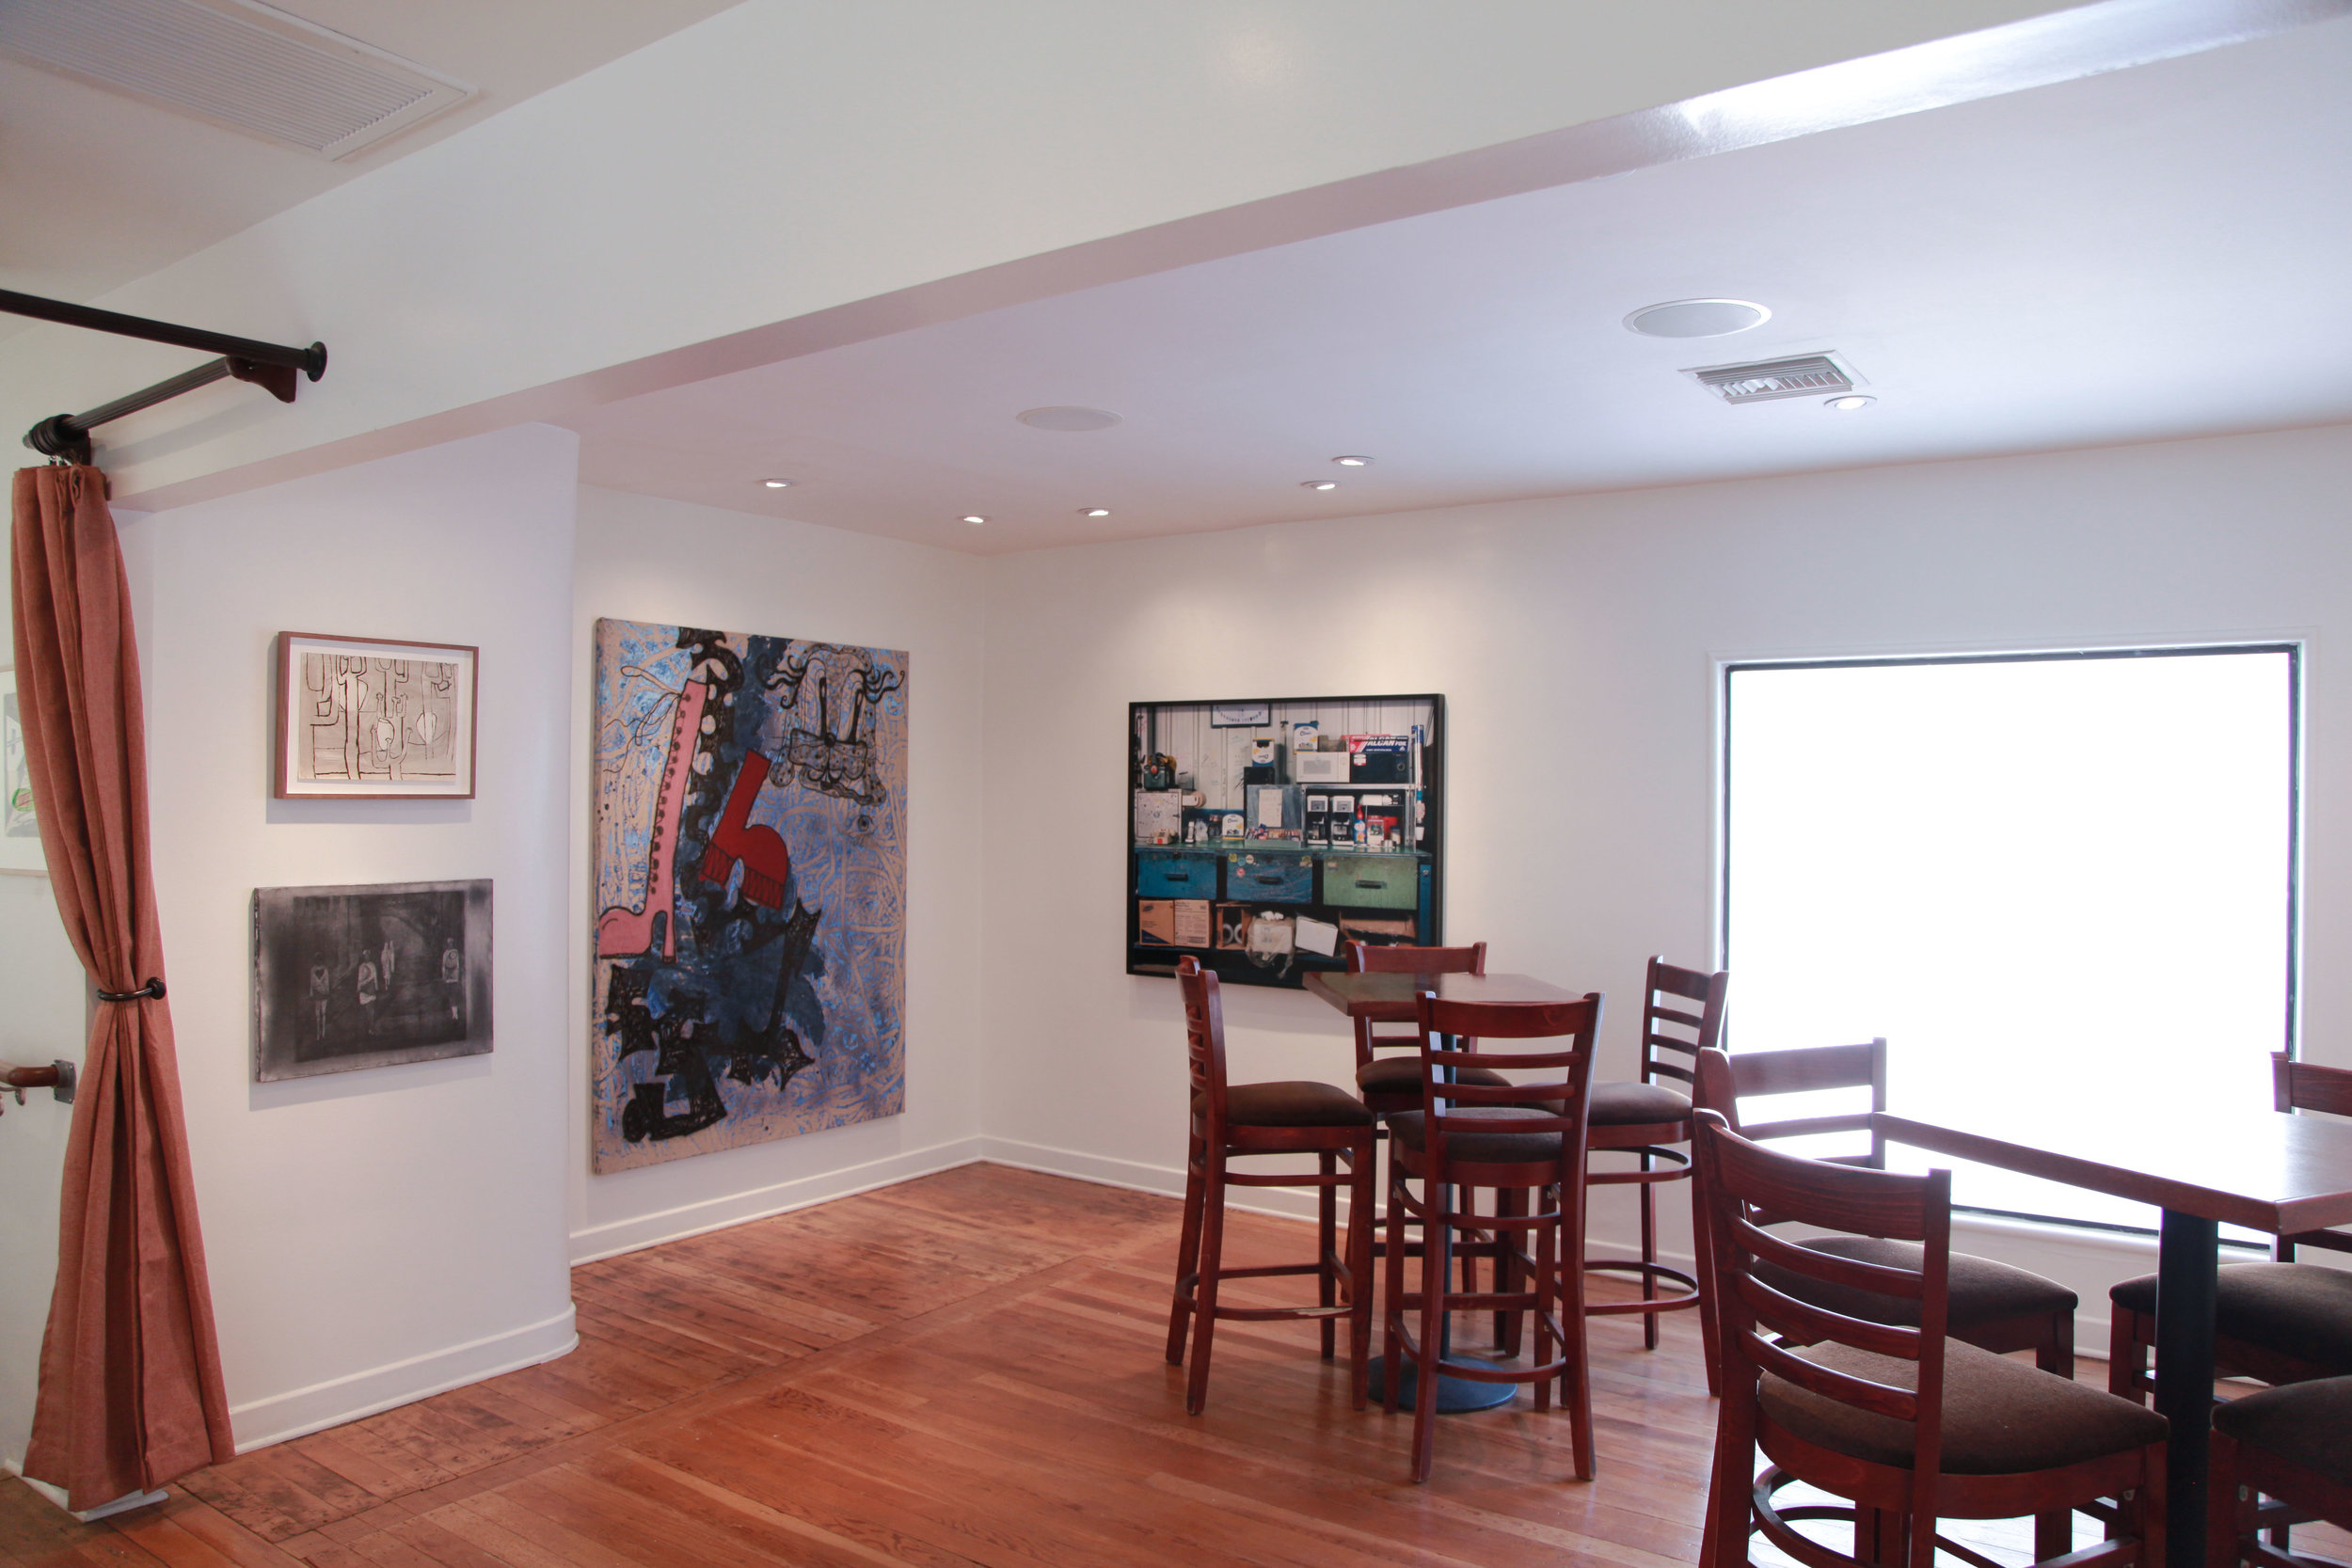 Installation view: Luchita Hurtado, Silke Otto-Knapp, Ida Ekblad, Sharon Lockhart